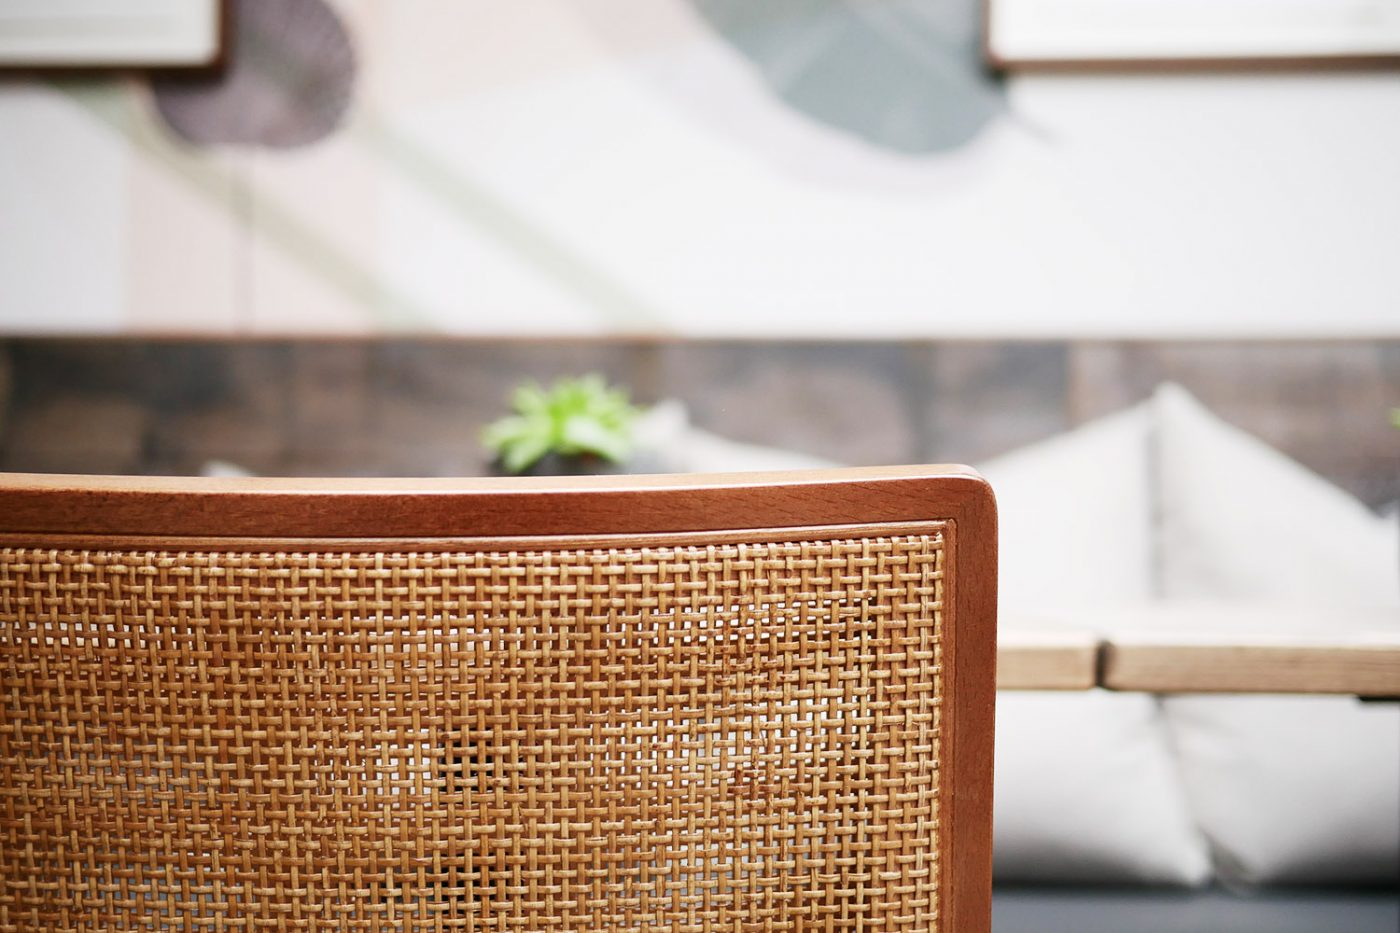 Mam_Restaurant_bar_Design_details_seating_chair